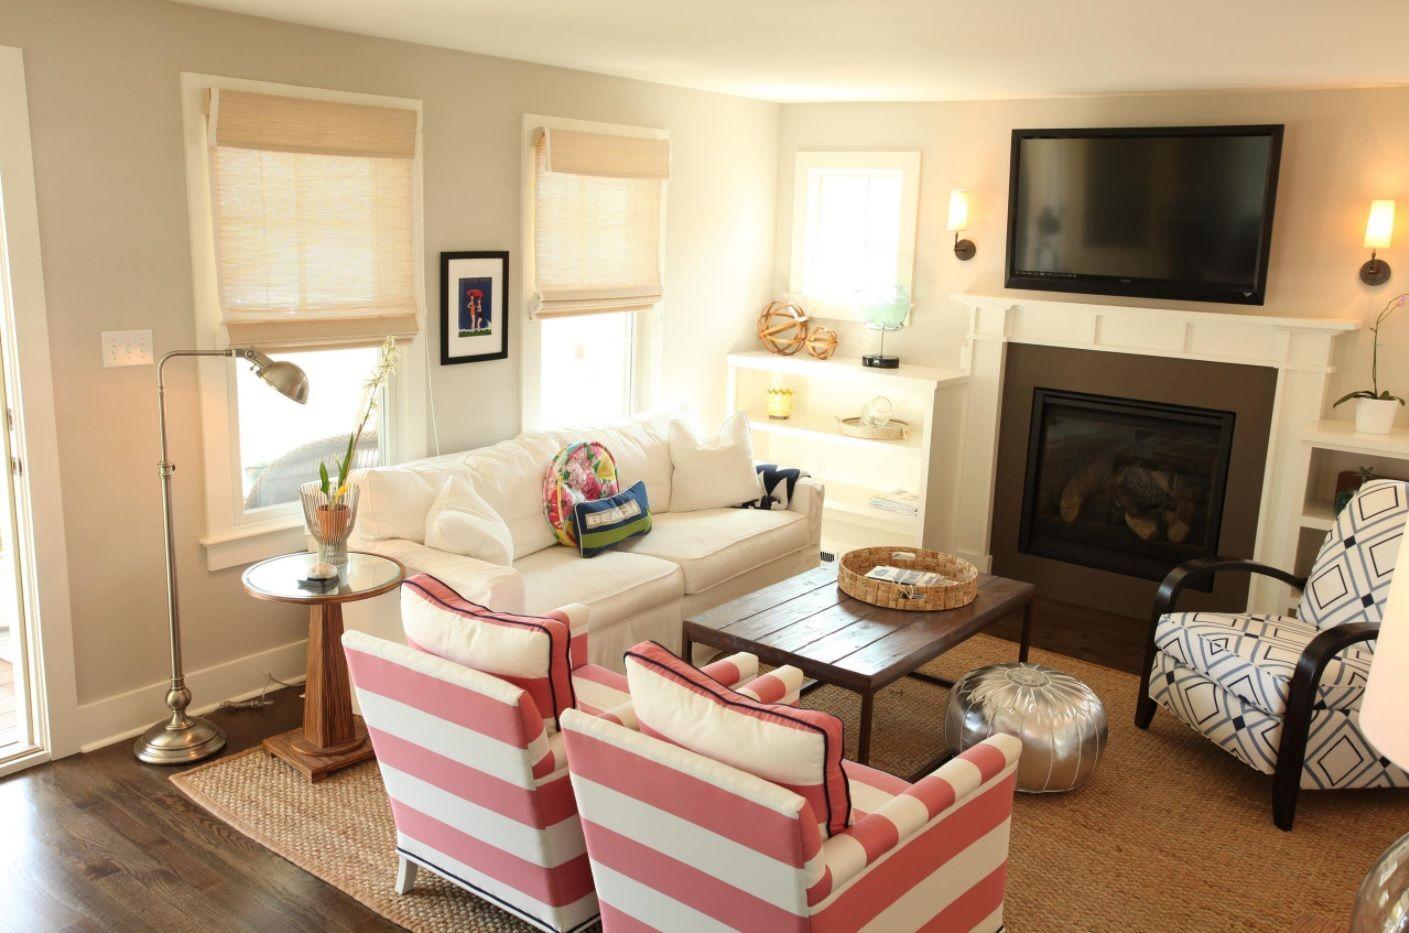 Living Room Layout Design & Decoration Ideas - Small Design Ideas